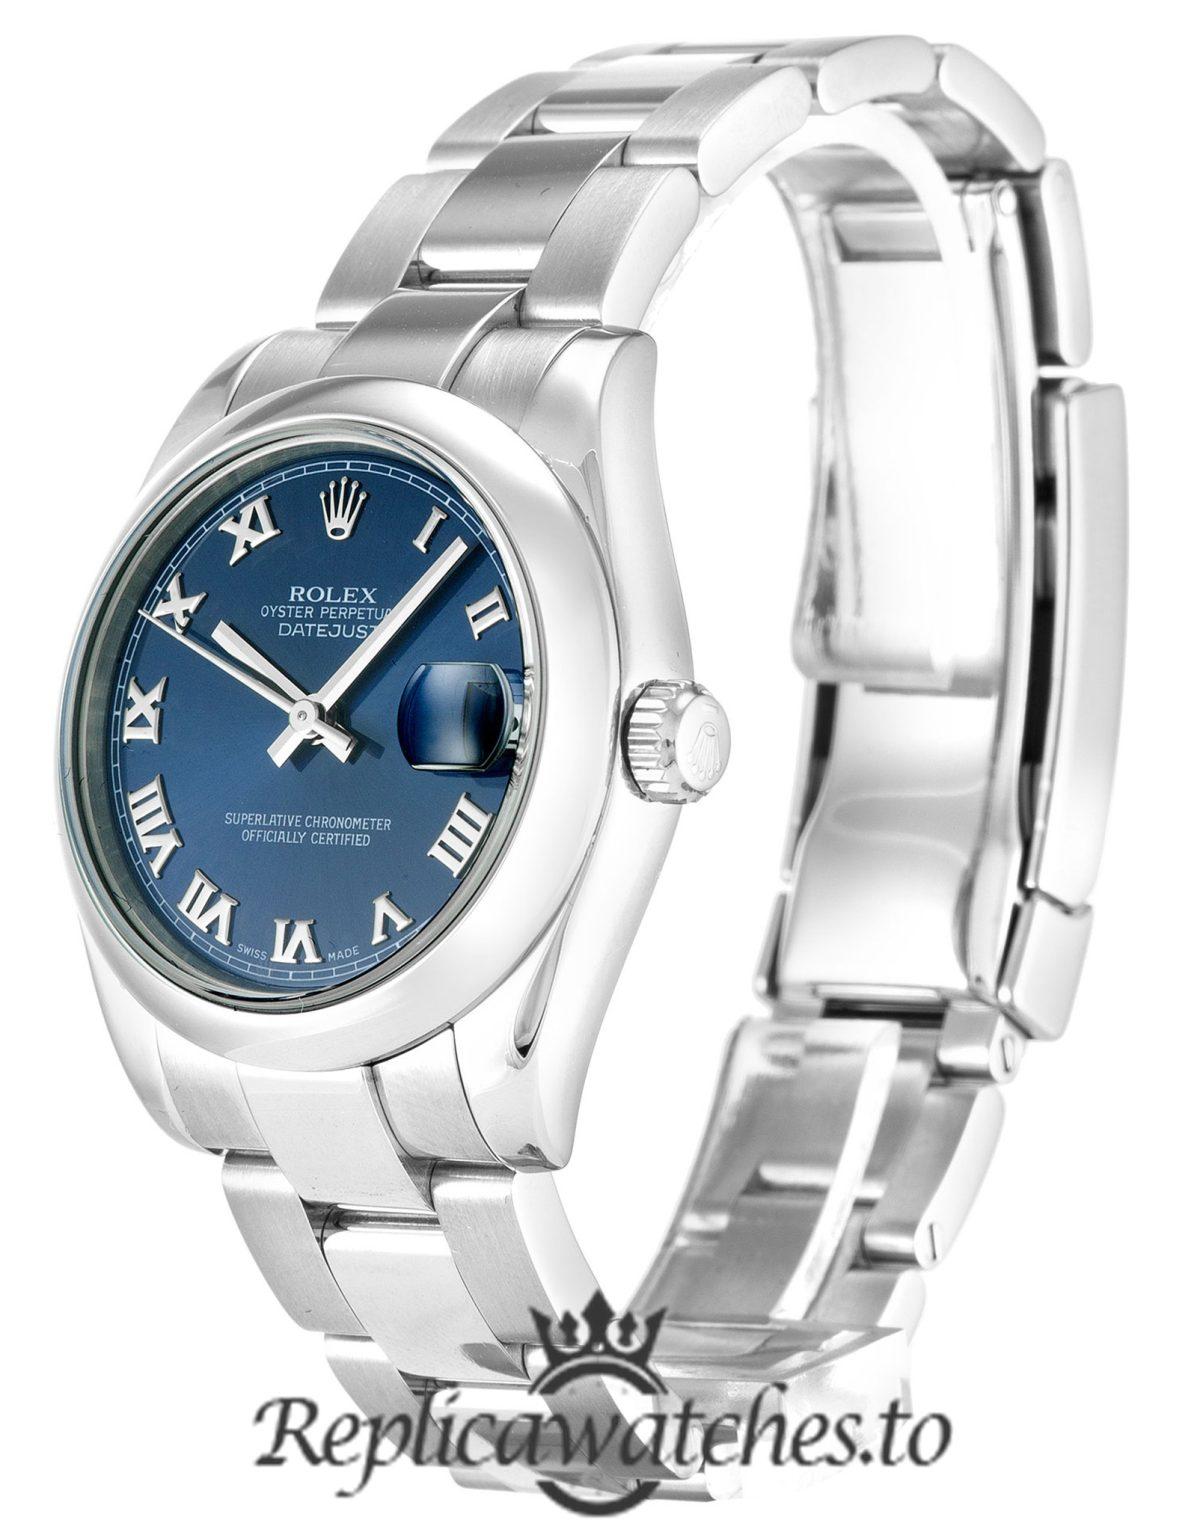 Rolex Datejust Replica 178240 003 Silver Bezel 31MM